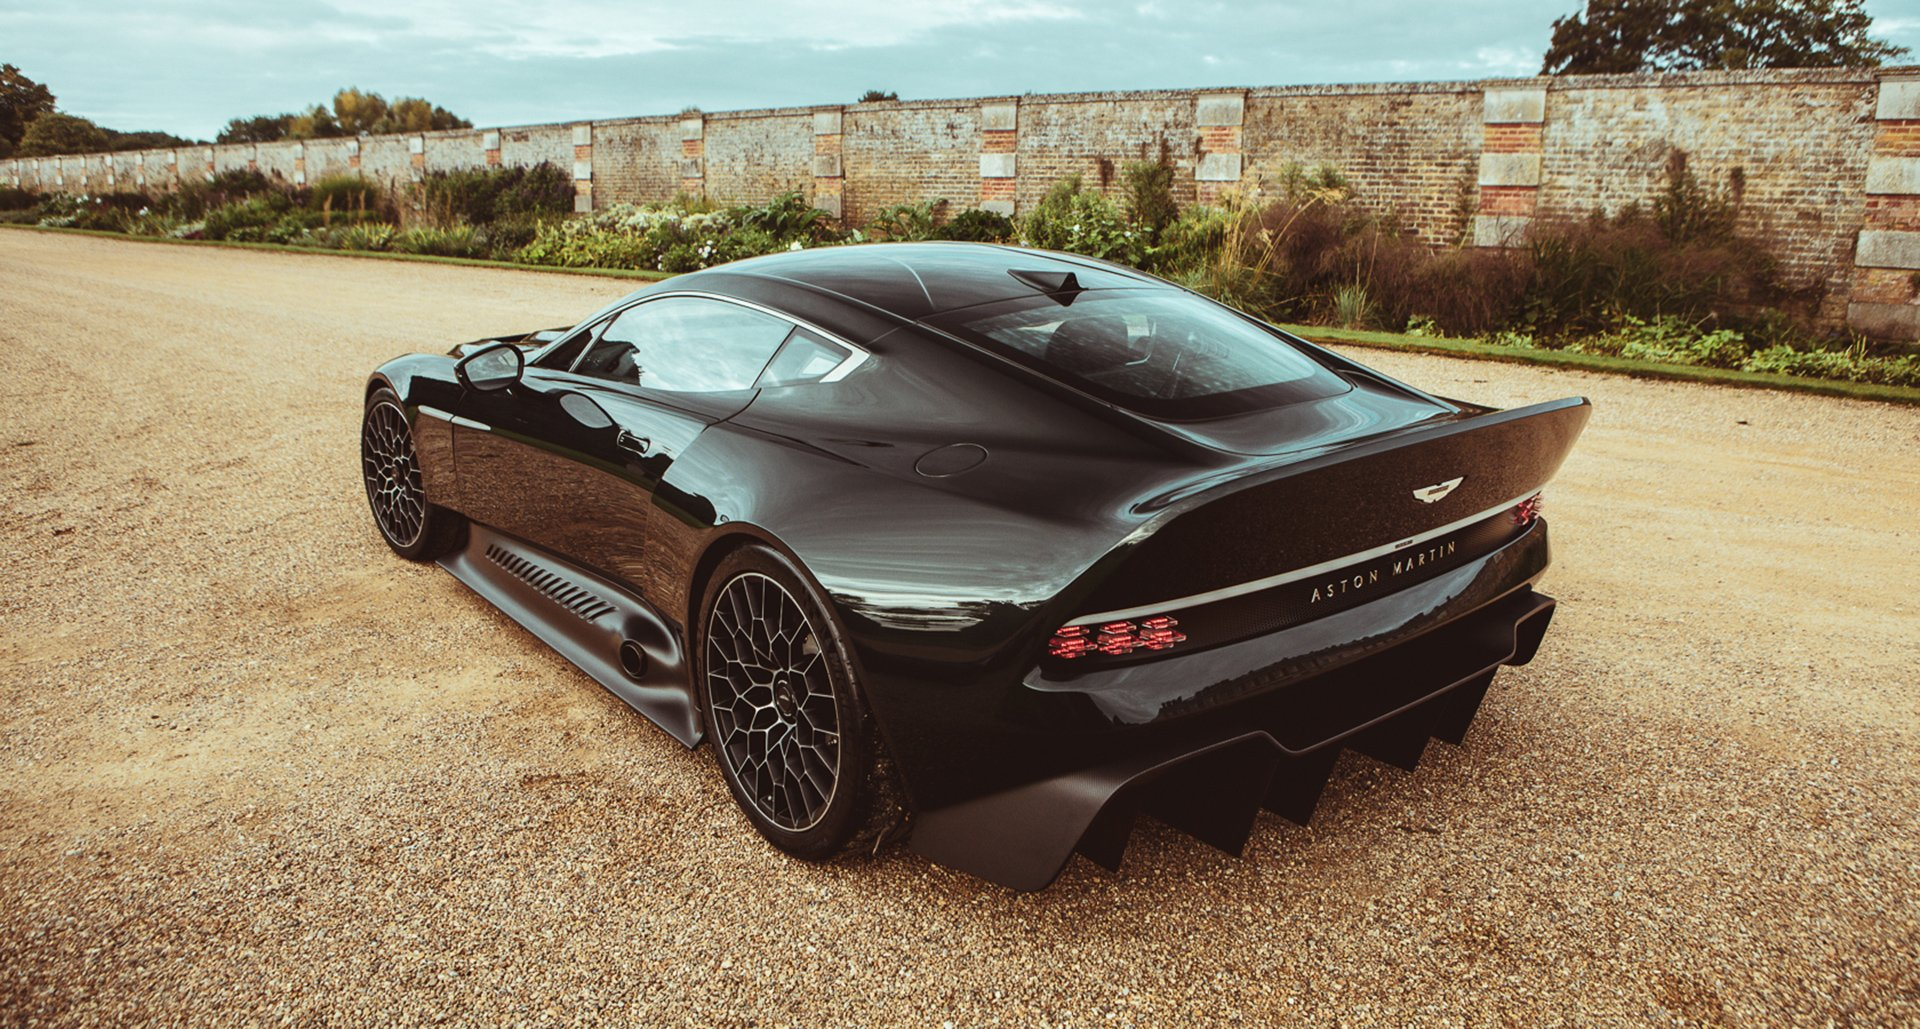 Aston Martin Victor Rear